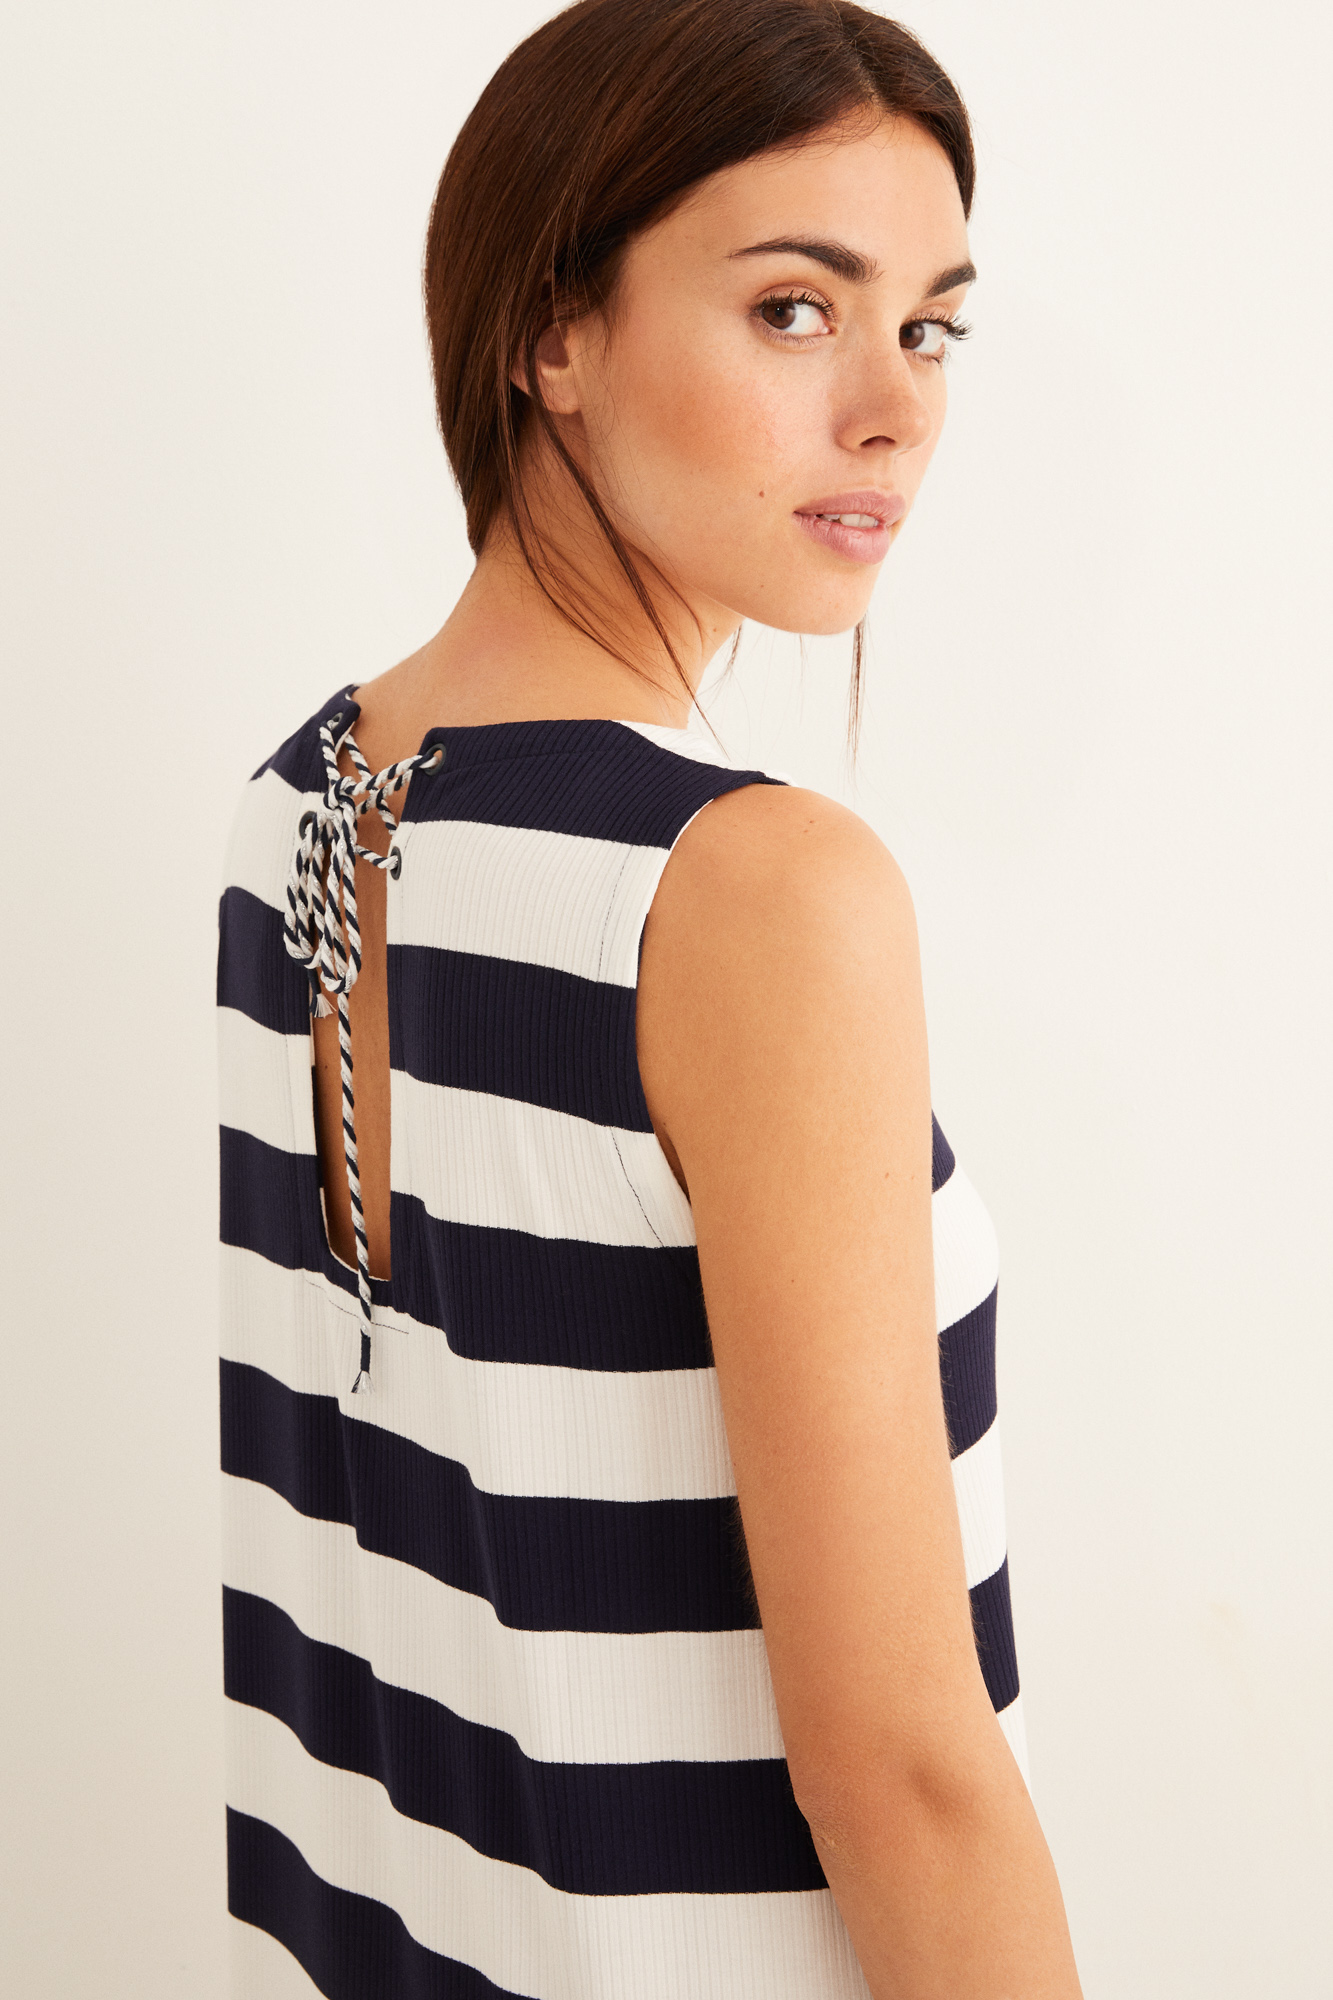 Vestido navy cordón espalda | Beachwear | Women'secret